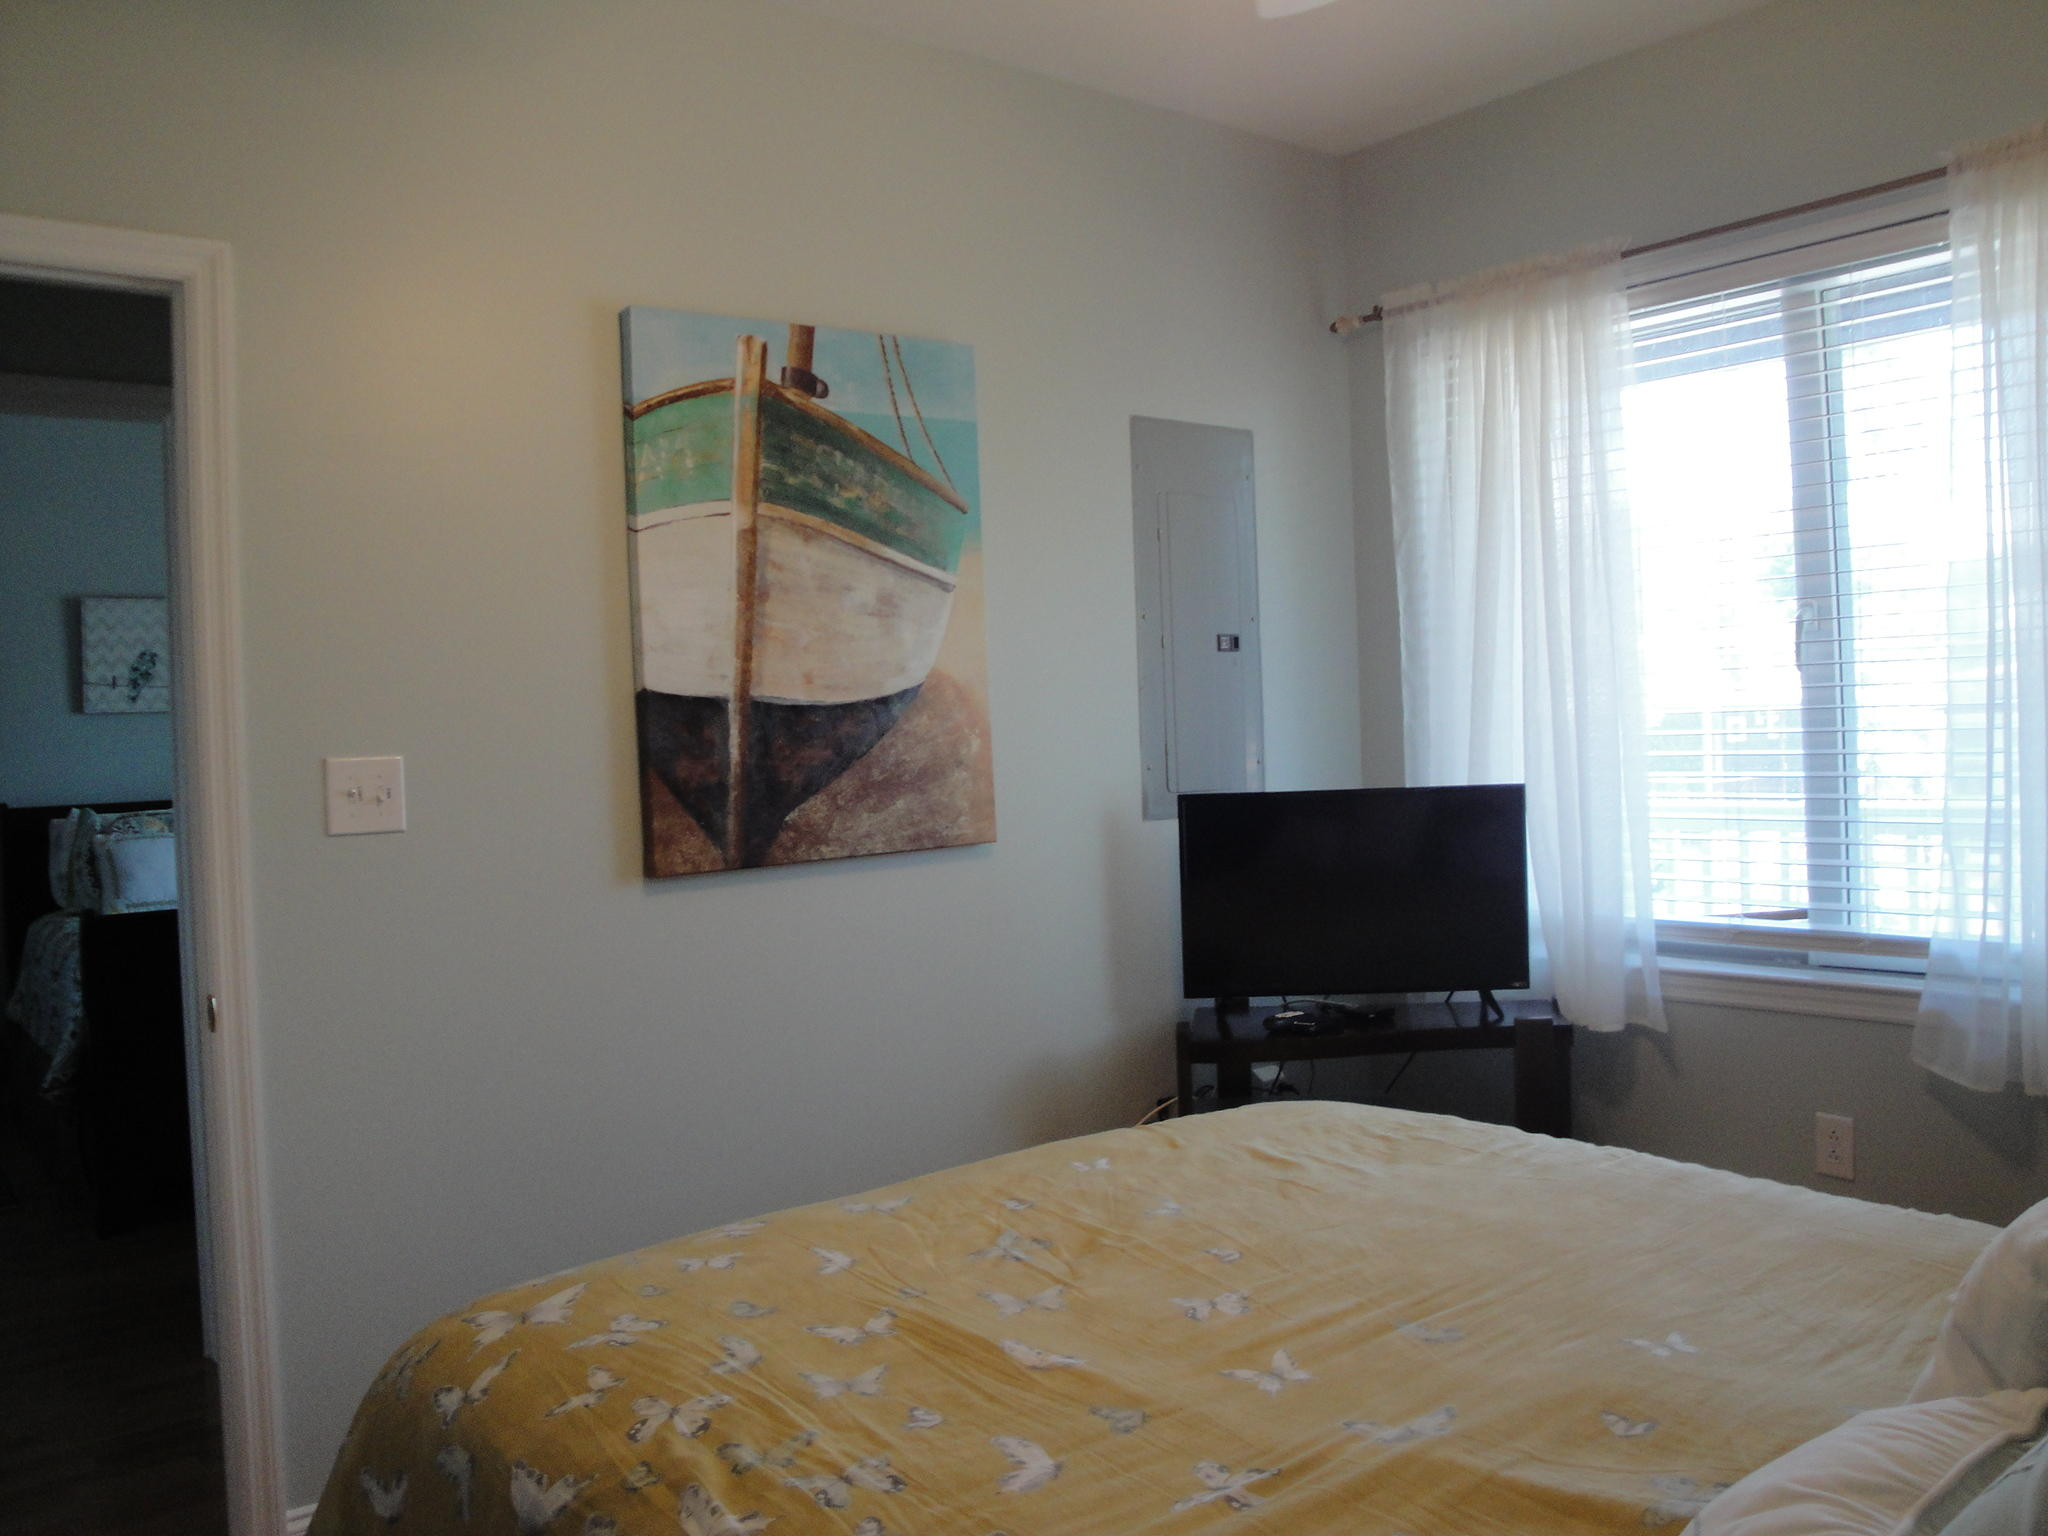 Pier Pointe Villas Homes For Sale - 117 Ashley, Folly Beach, SC - 2